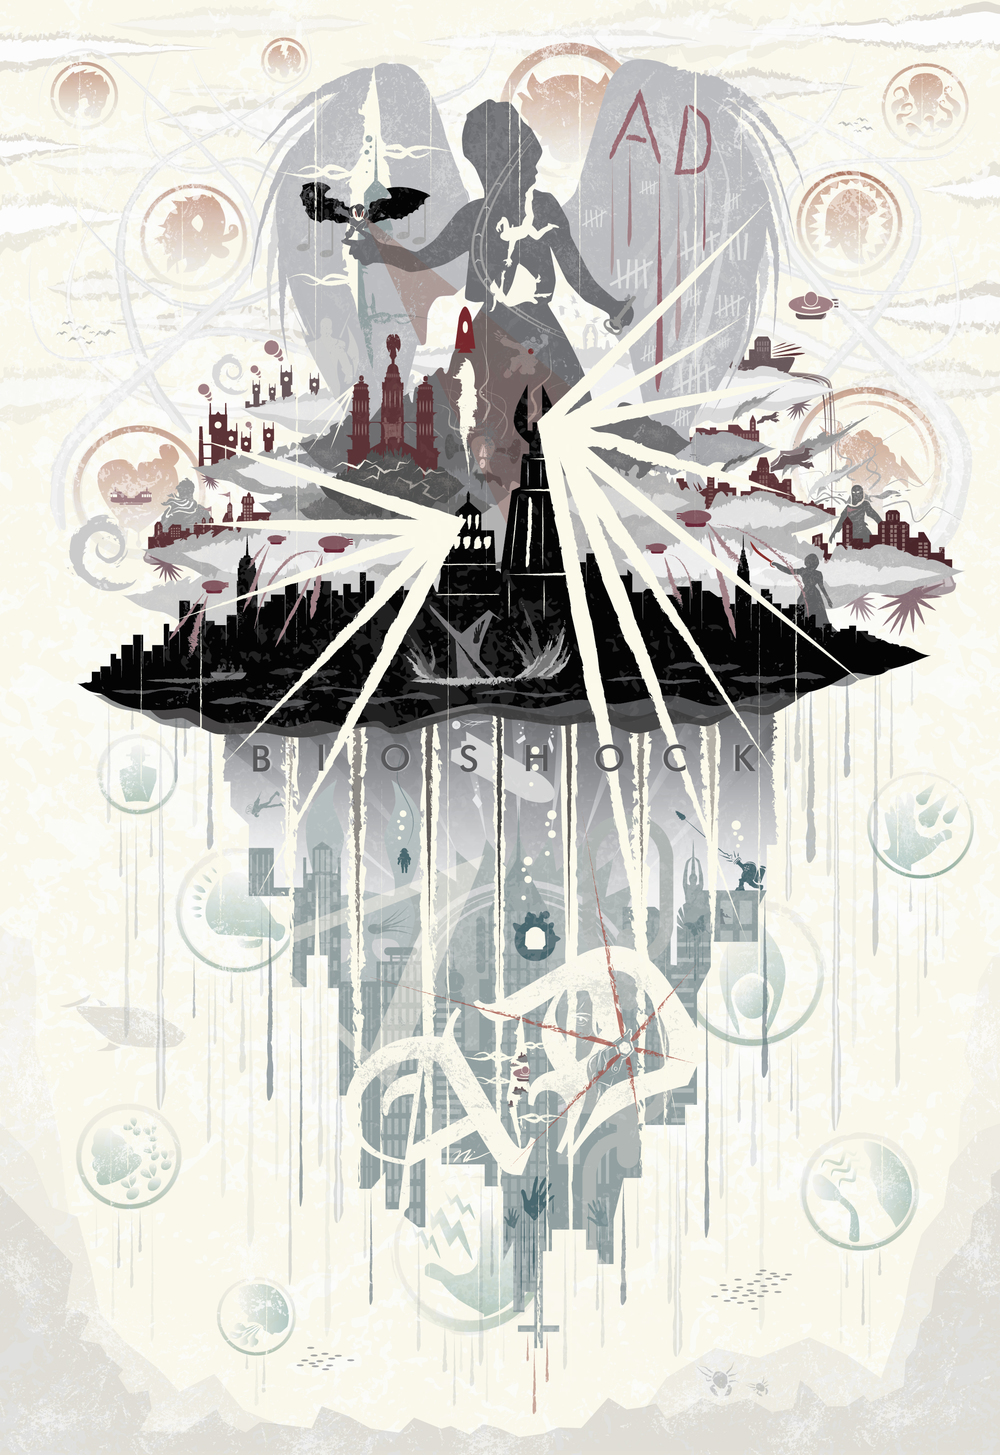 Bird-and-Cage-BioShock+Series+Poster.jpg